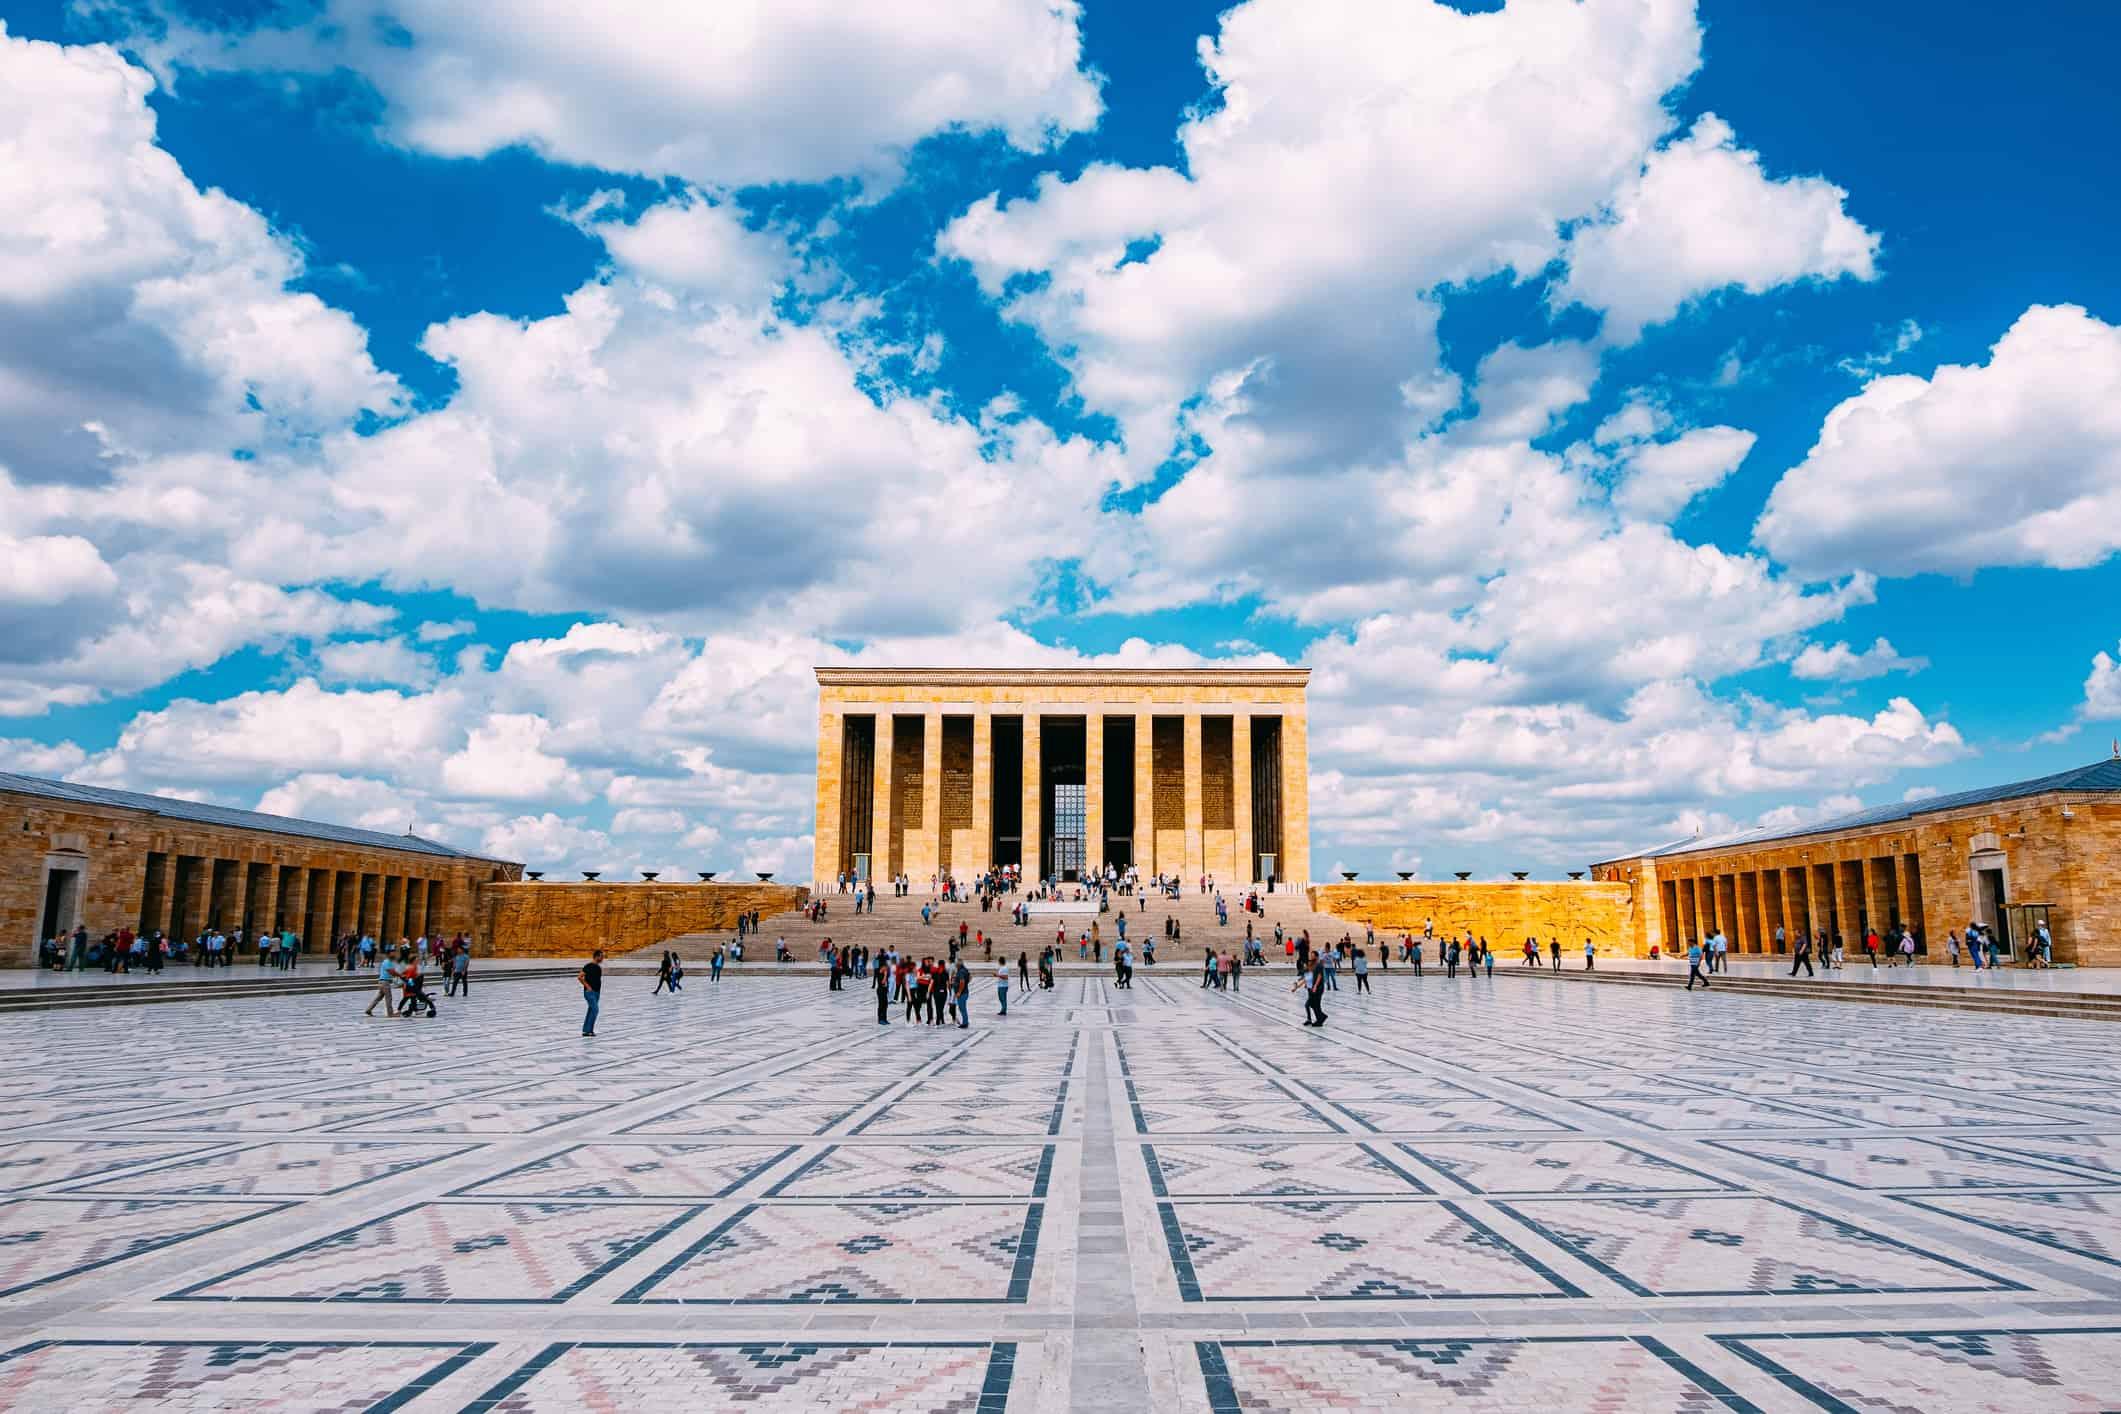 Ataturk's Mausoleum in Ankara, Turkey